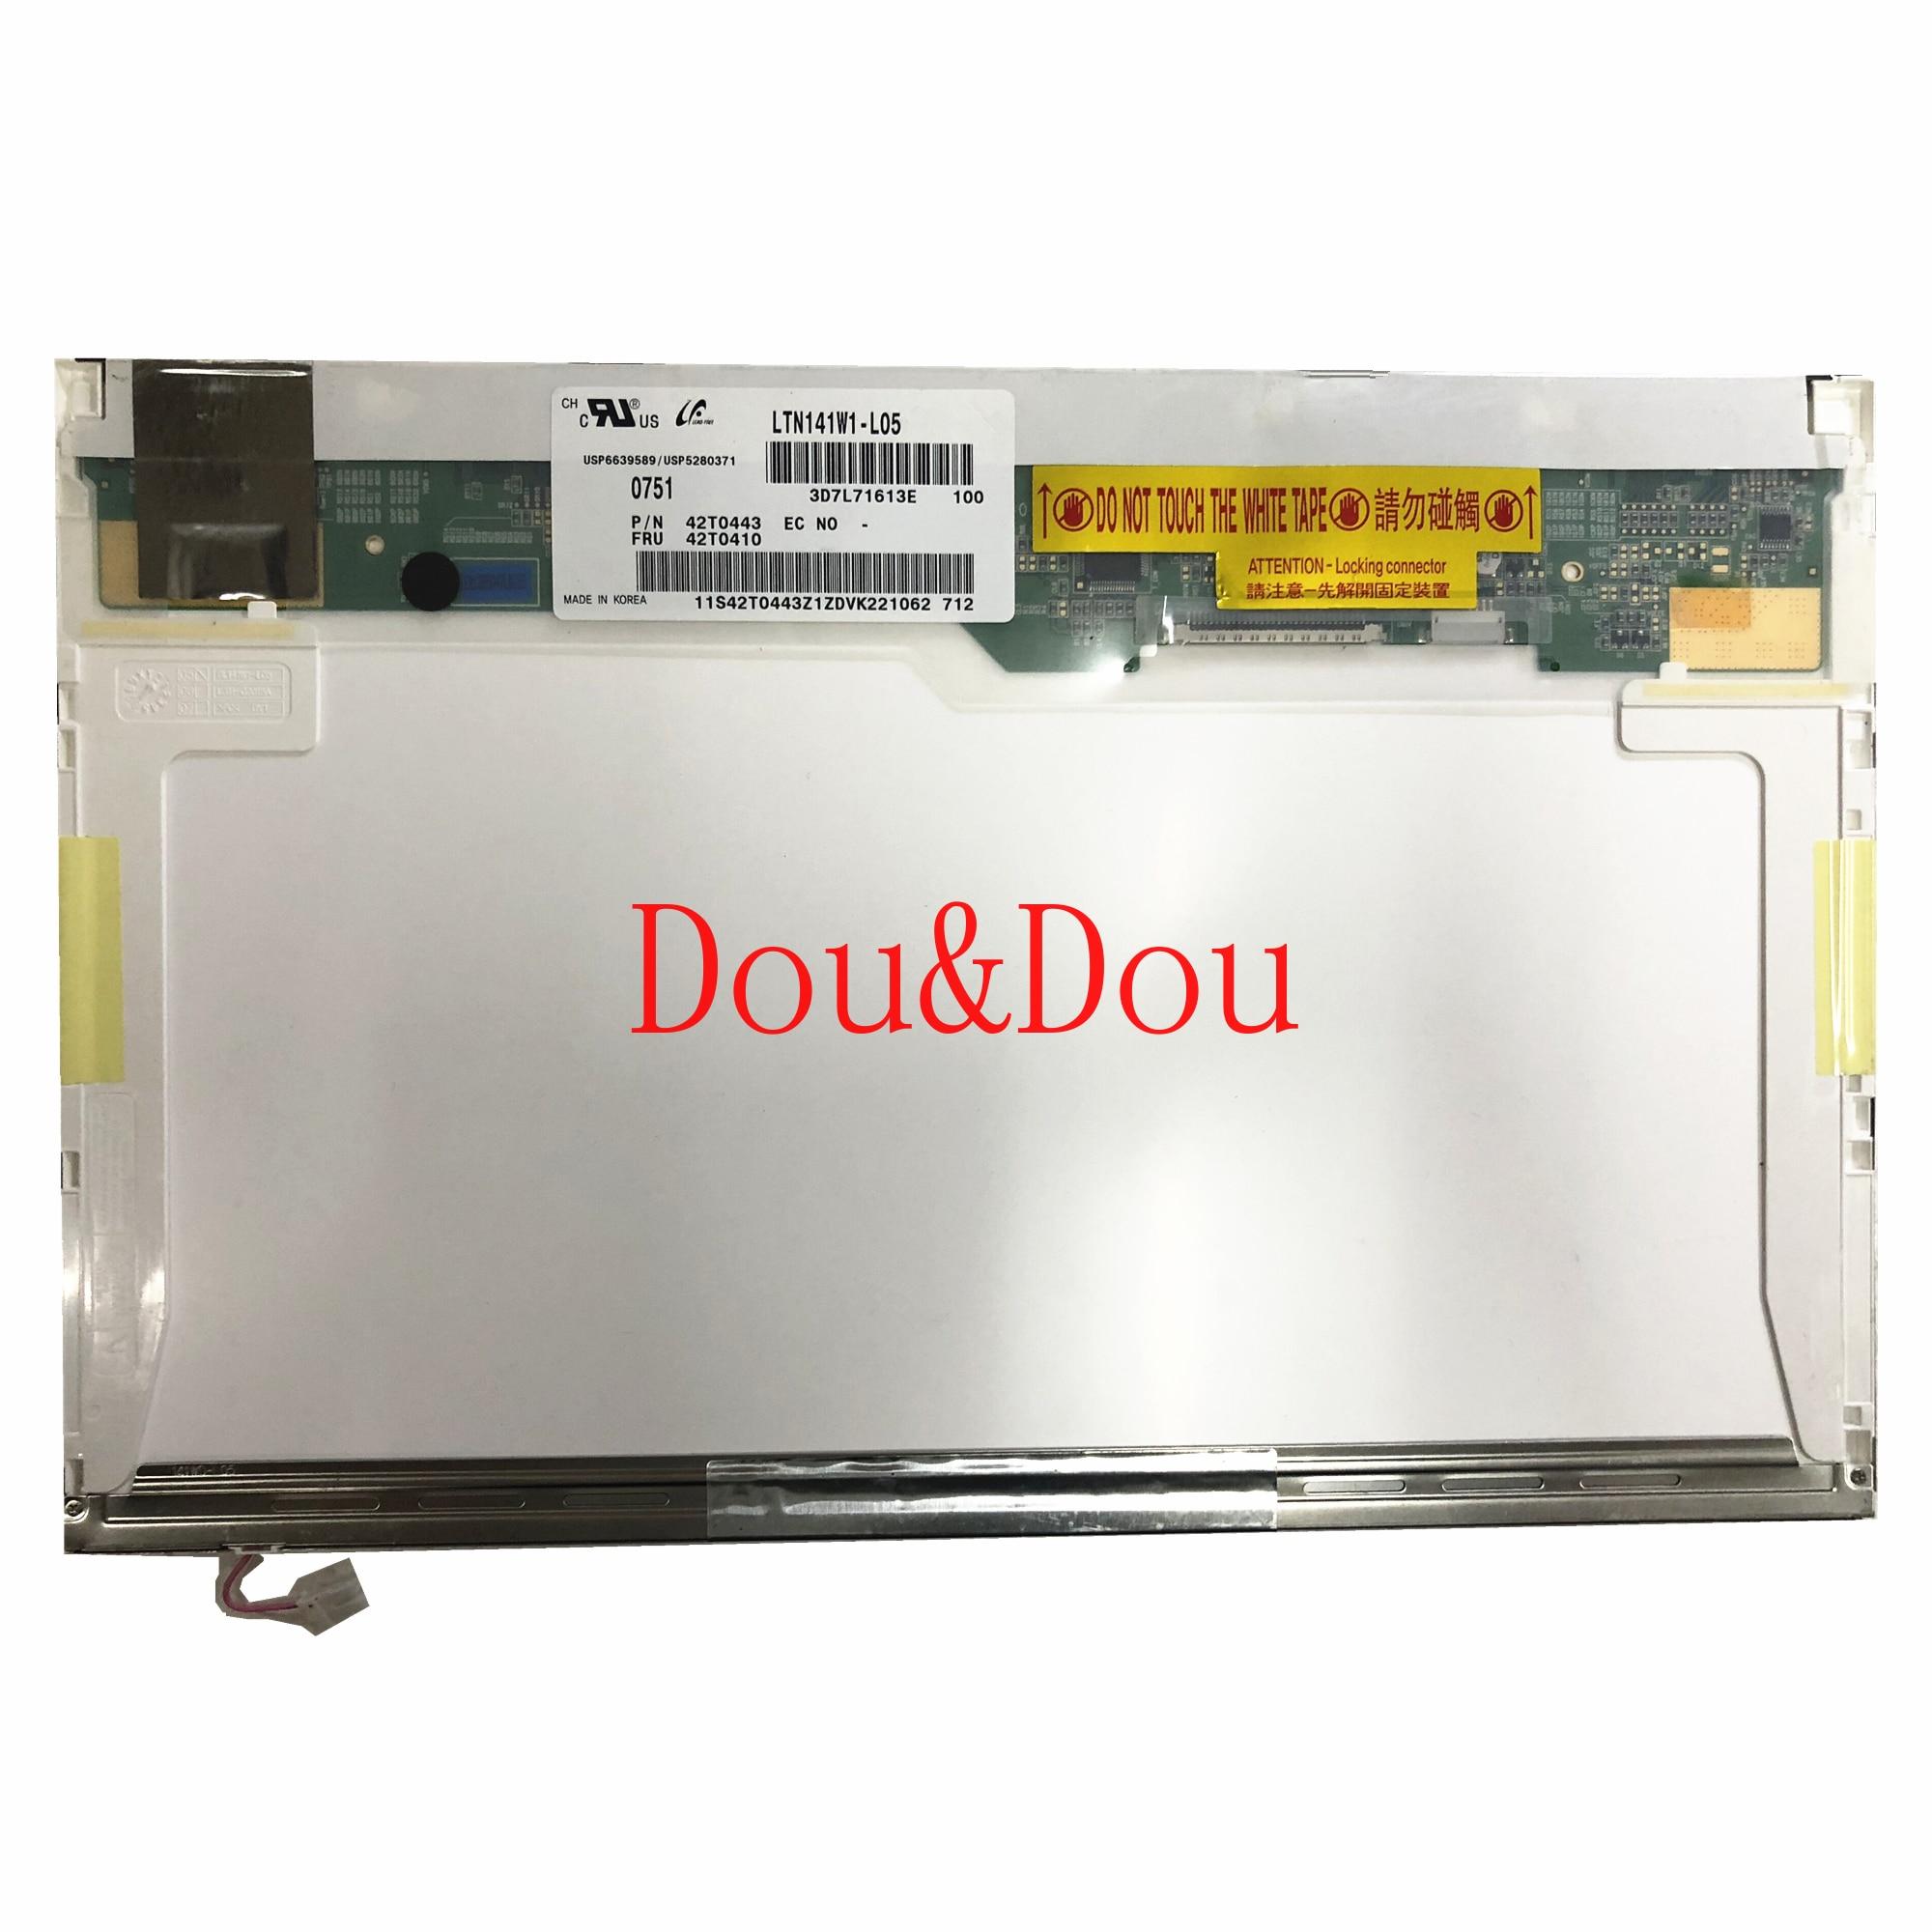 LTN141W1-L05 B141EW04 LTN141AT07 LTN141AT13 LTN141W3-L01 N141I3-L02 LP141WX3-TLN1 LP141WX1-TLB4 LCD شاشة 1280*800 LVDS 30 دبوس